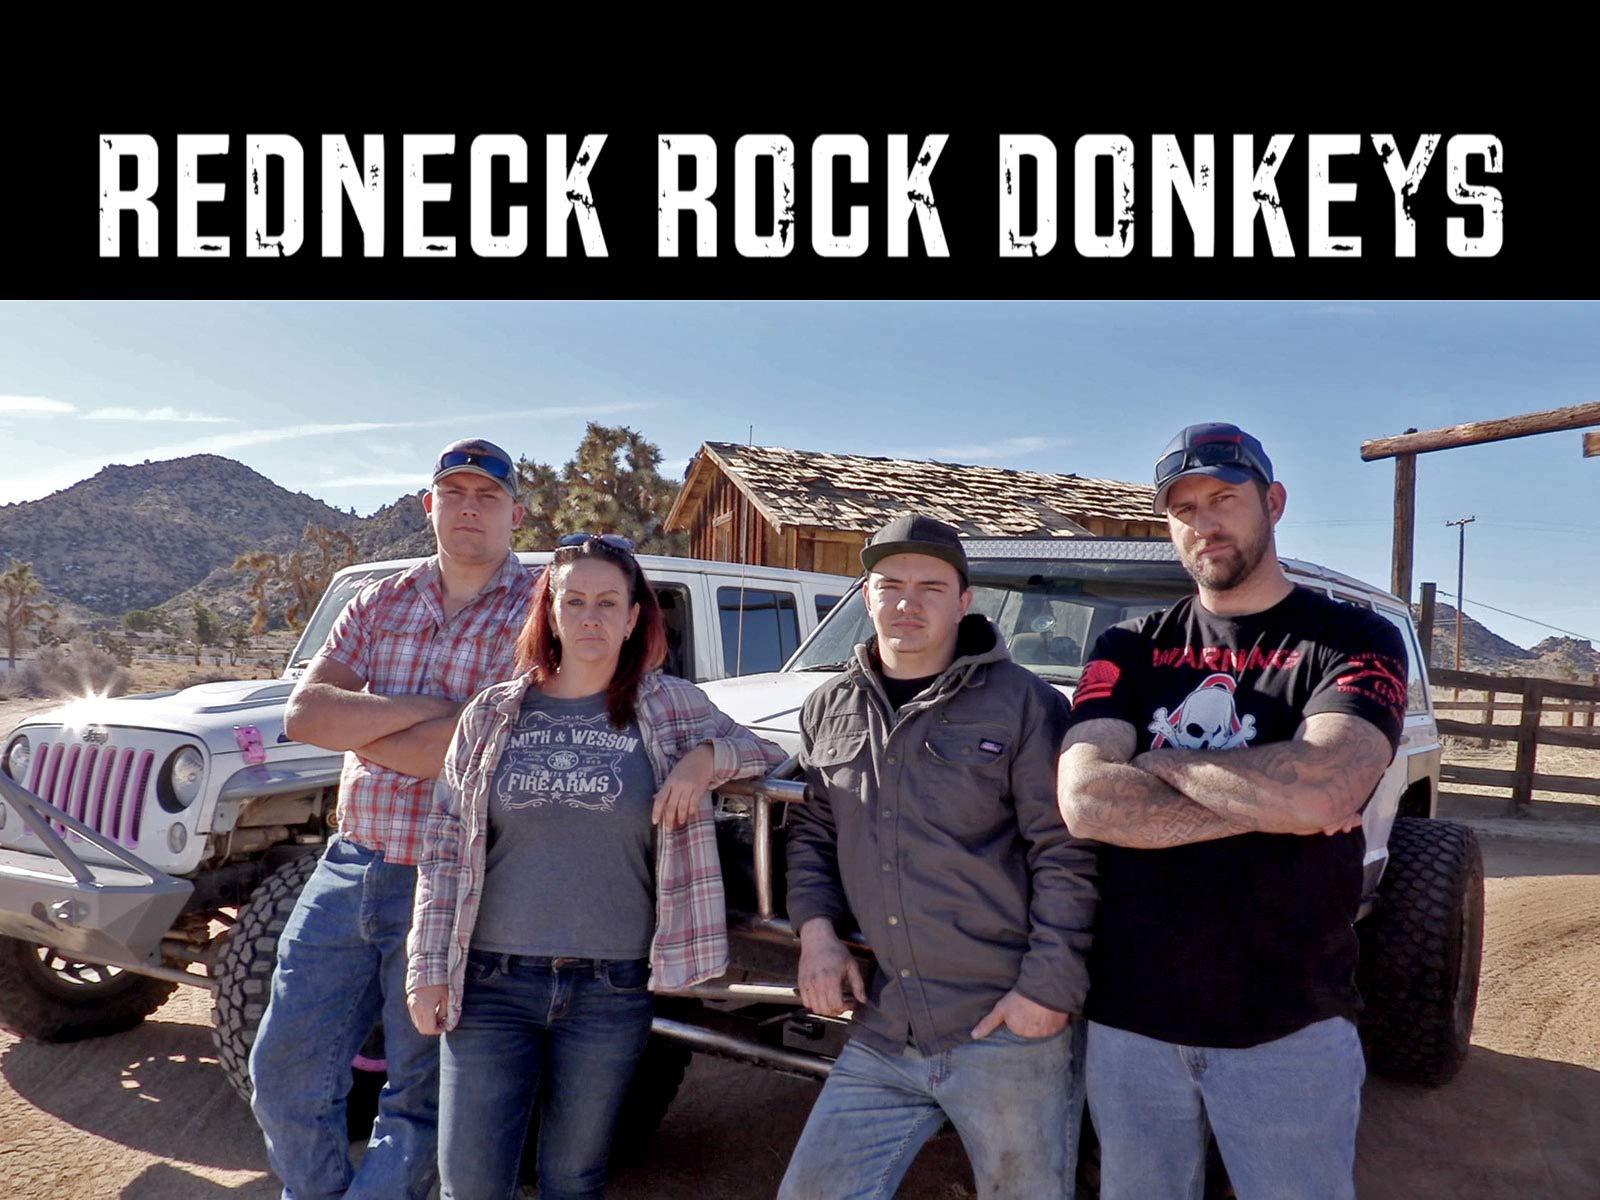 The Redneck Rock Donkeys - Season 1